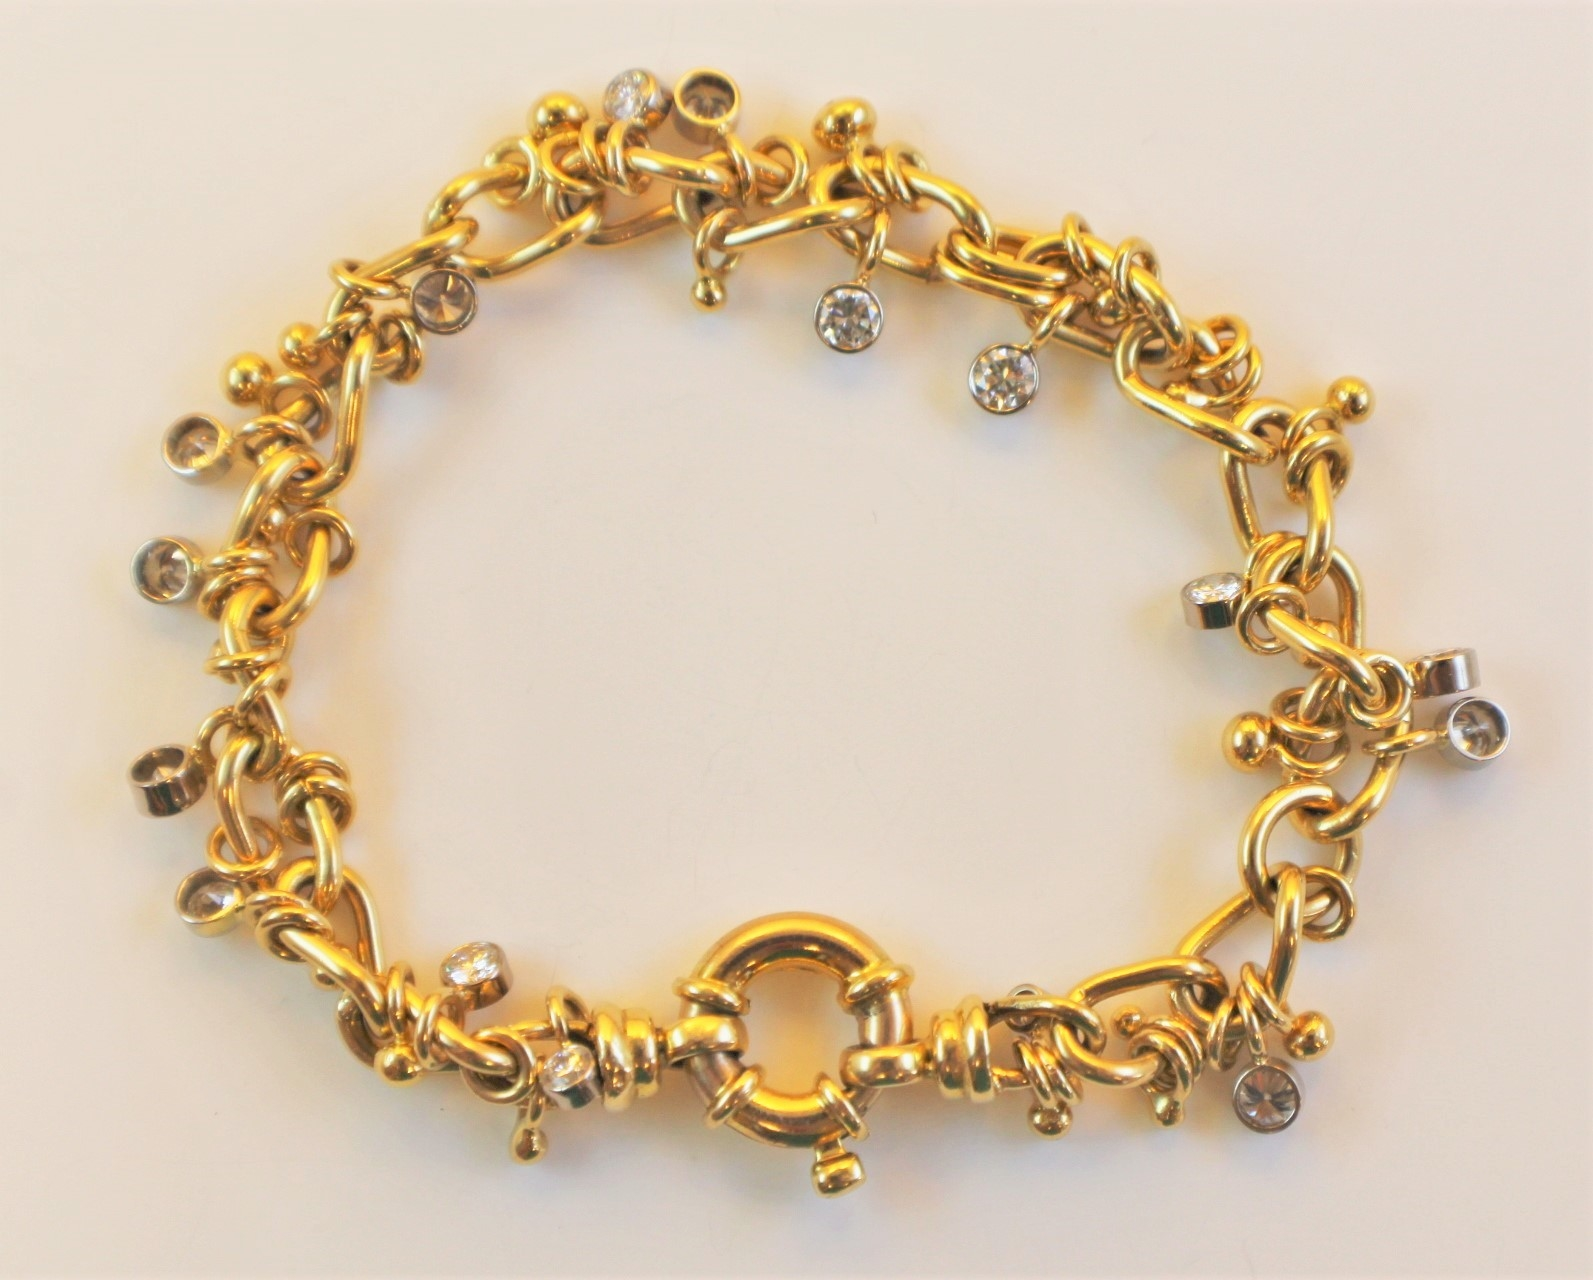 Prospect Jewelers Legacy image 15